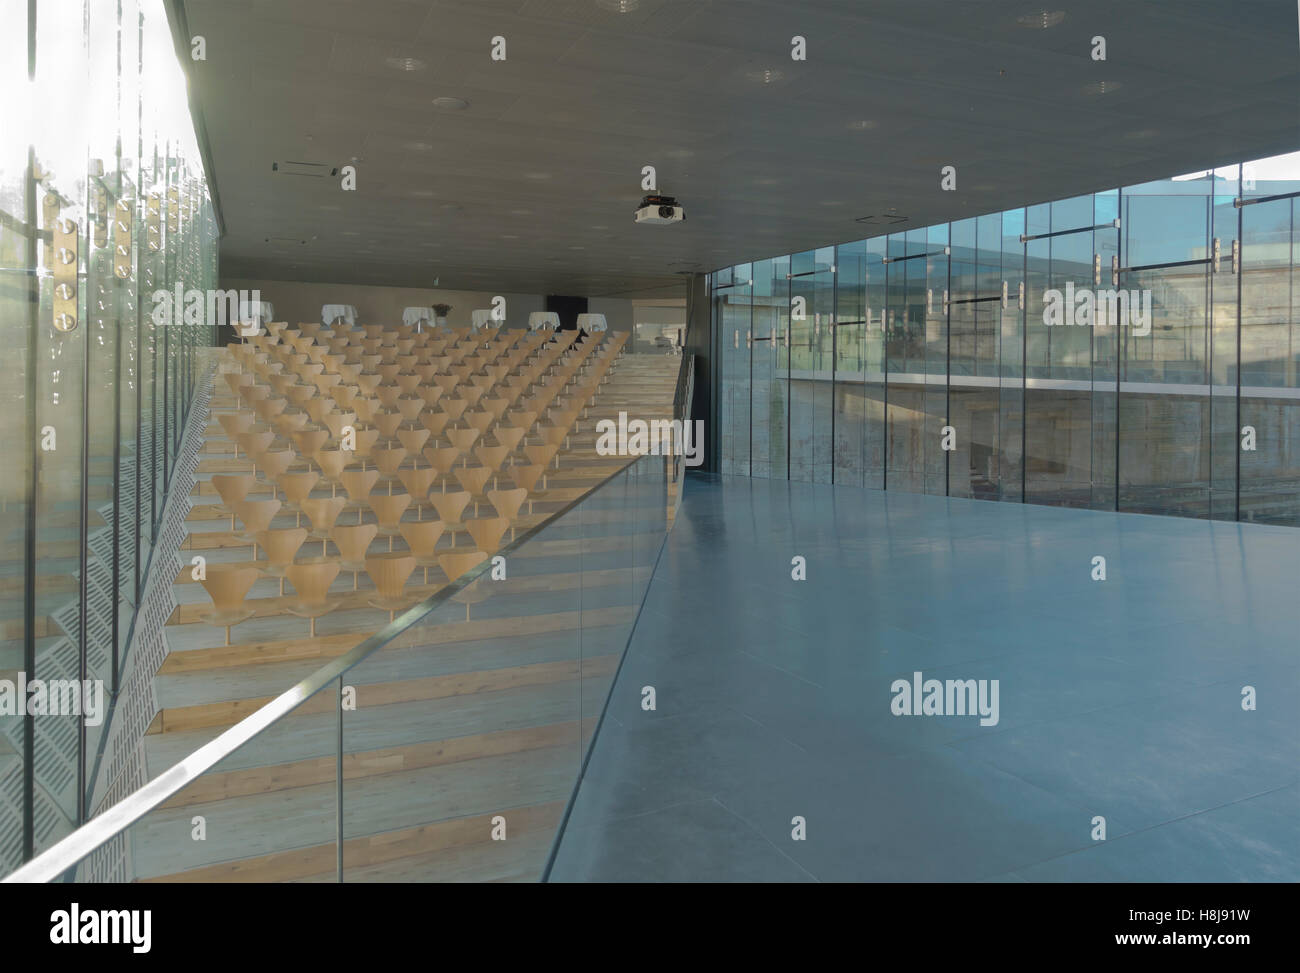 Auditorios en el Danish Maritime Museum, M/S Museet para Søfart Helsingor, en Dinamarca. El arquitecto Bjarke Ingels BIG. Arne Jacobsen sillas serie 7 Foto de stock